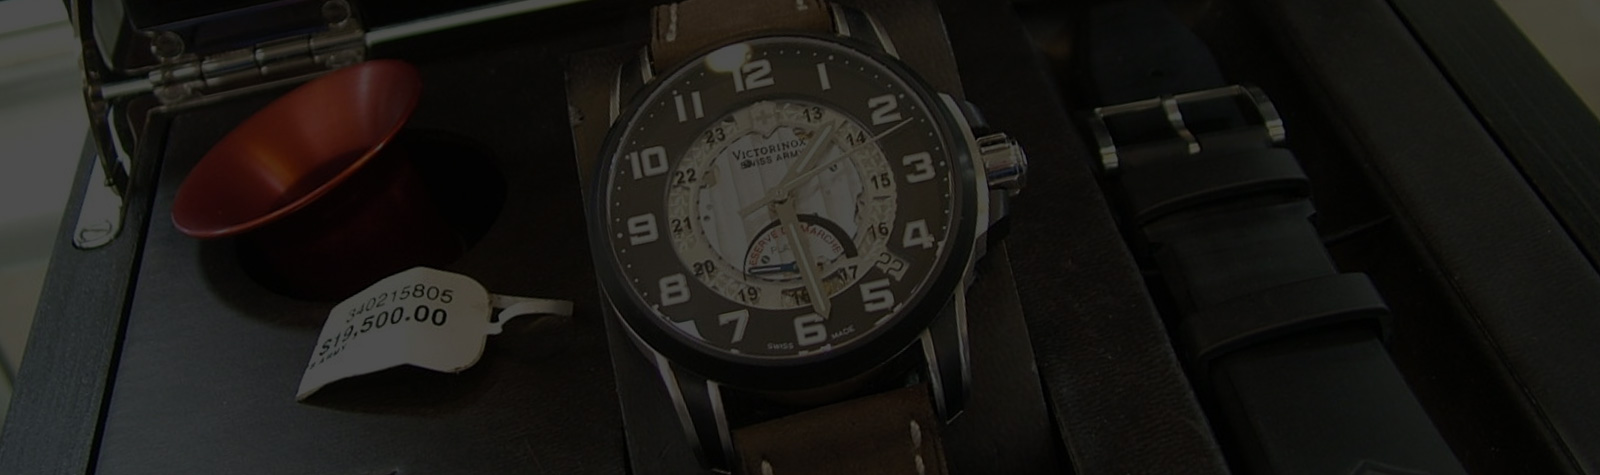 MEET THE WATCH: Victorinox Swiss Army 2006 Legacy Réserve de Marche Platine Ultra Watch